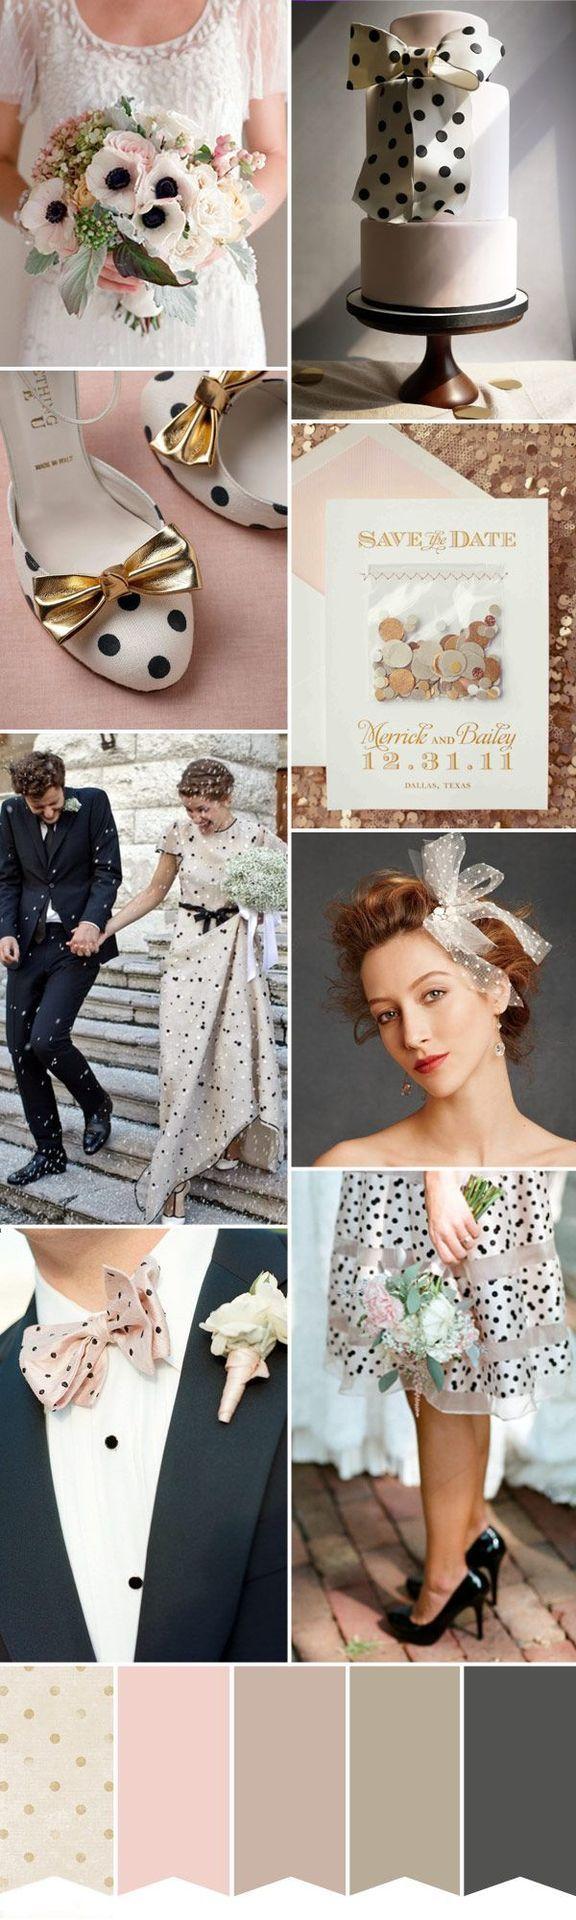 Polka Dot Wedding Inspiration ... om ganska små bröllops saker